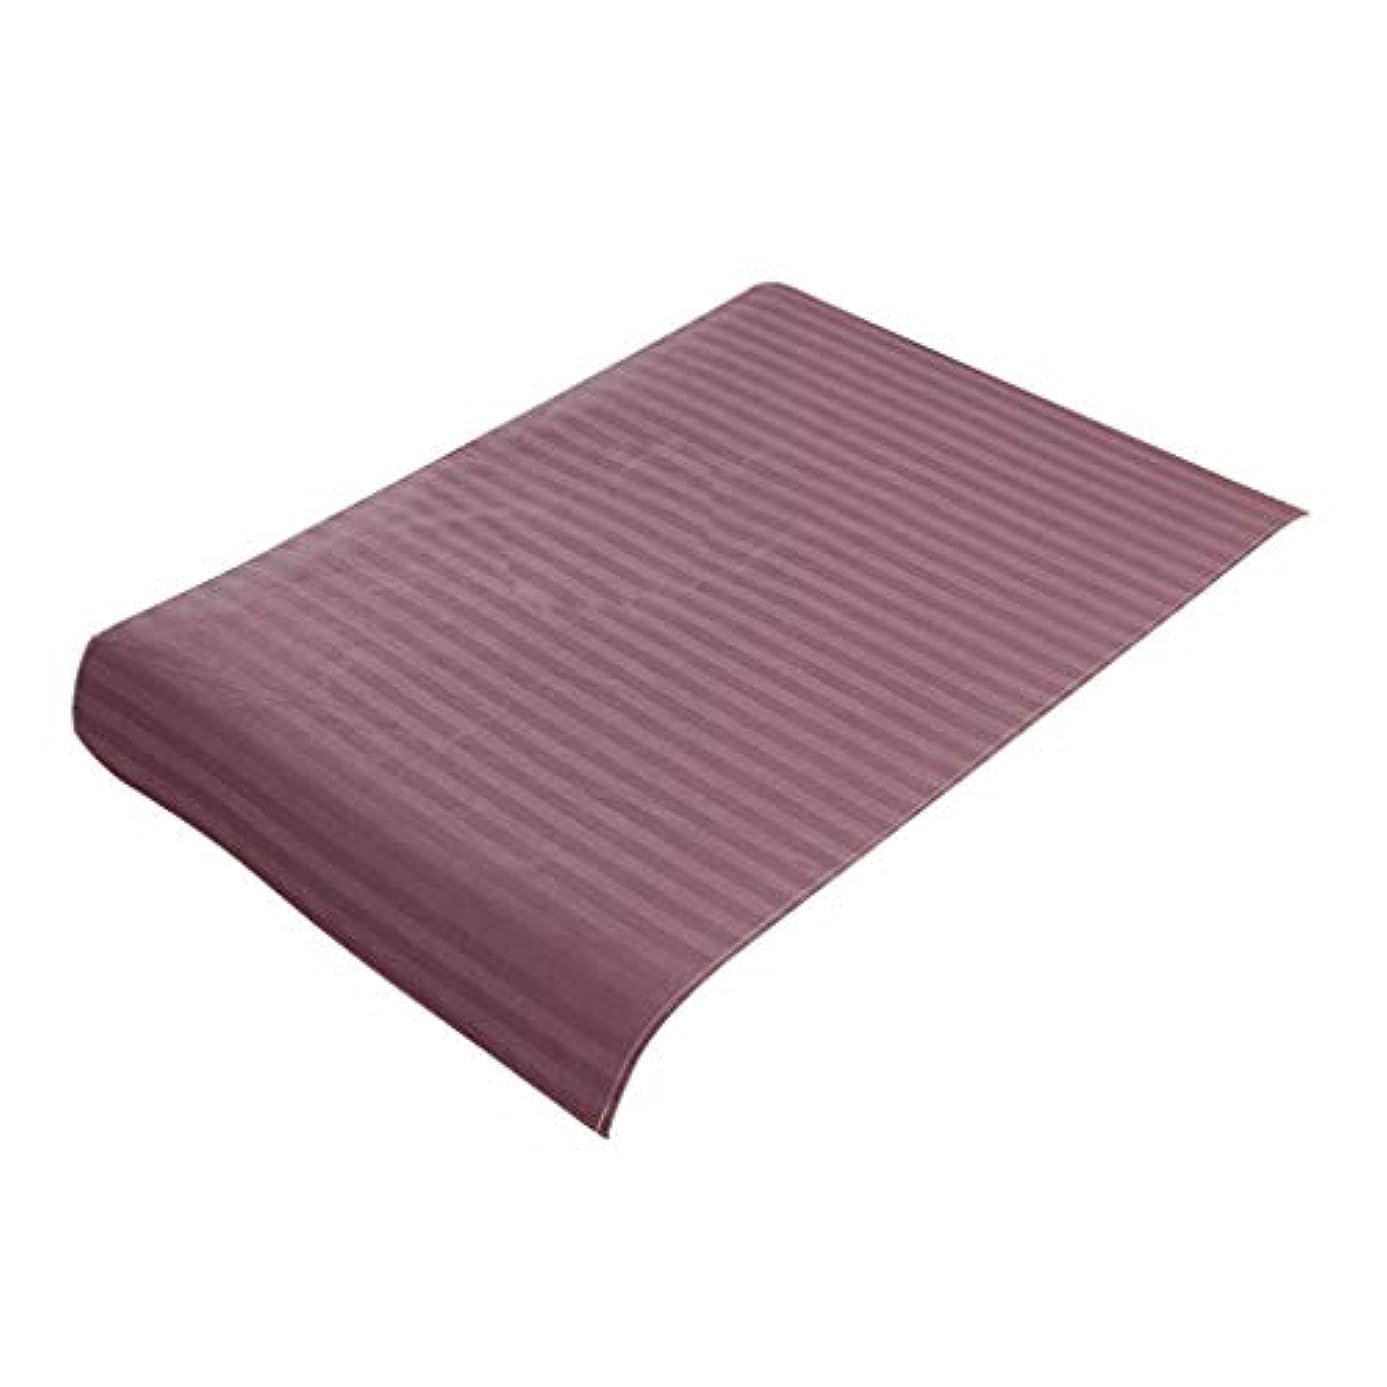 P Prettyia スパ マッサージベッドカバー 美容ベッドカバー 綿製 断面 マッサージテーブルスカート 60x90cm - 紫